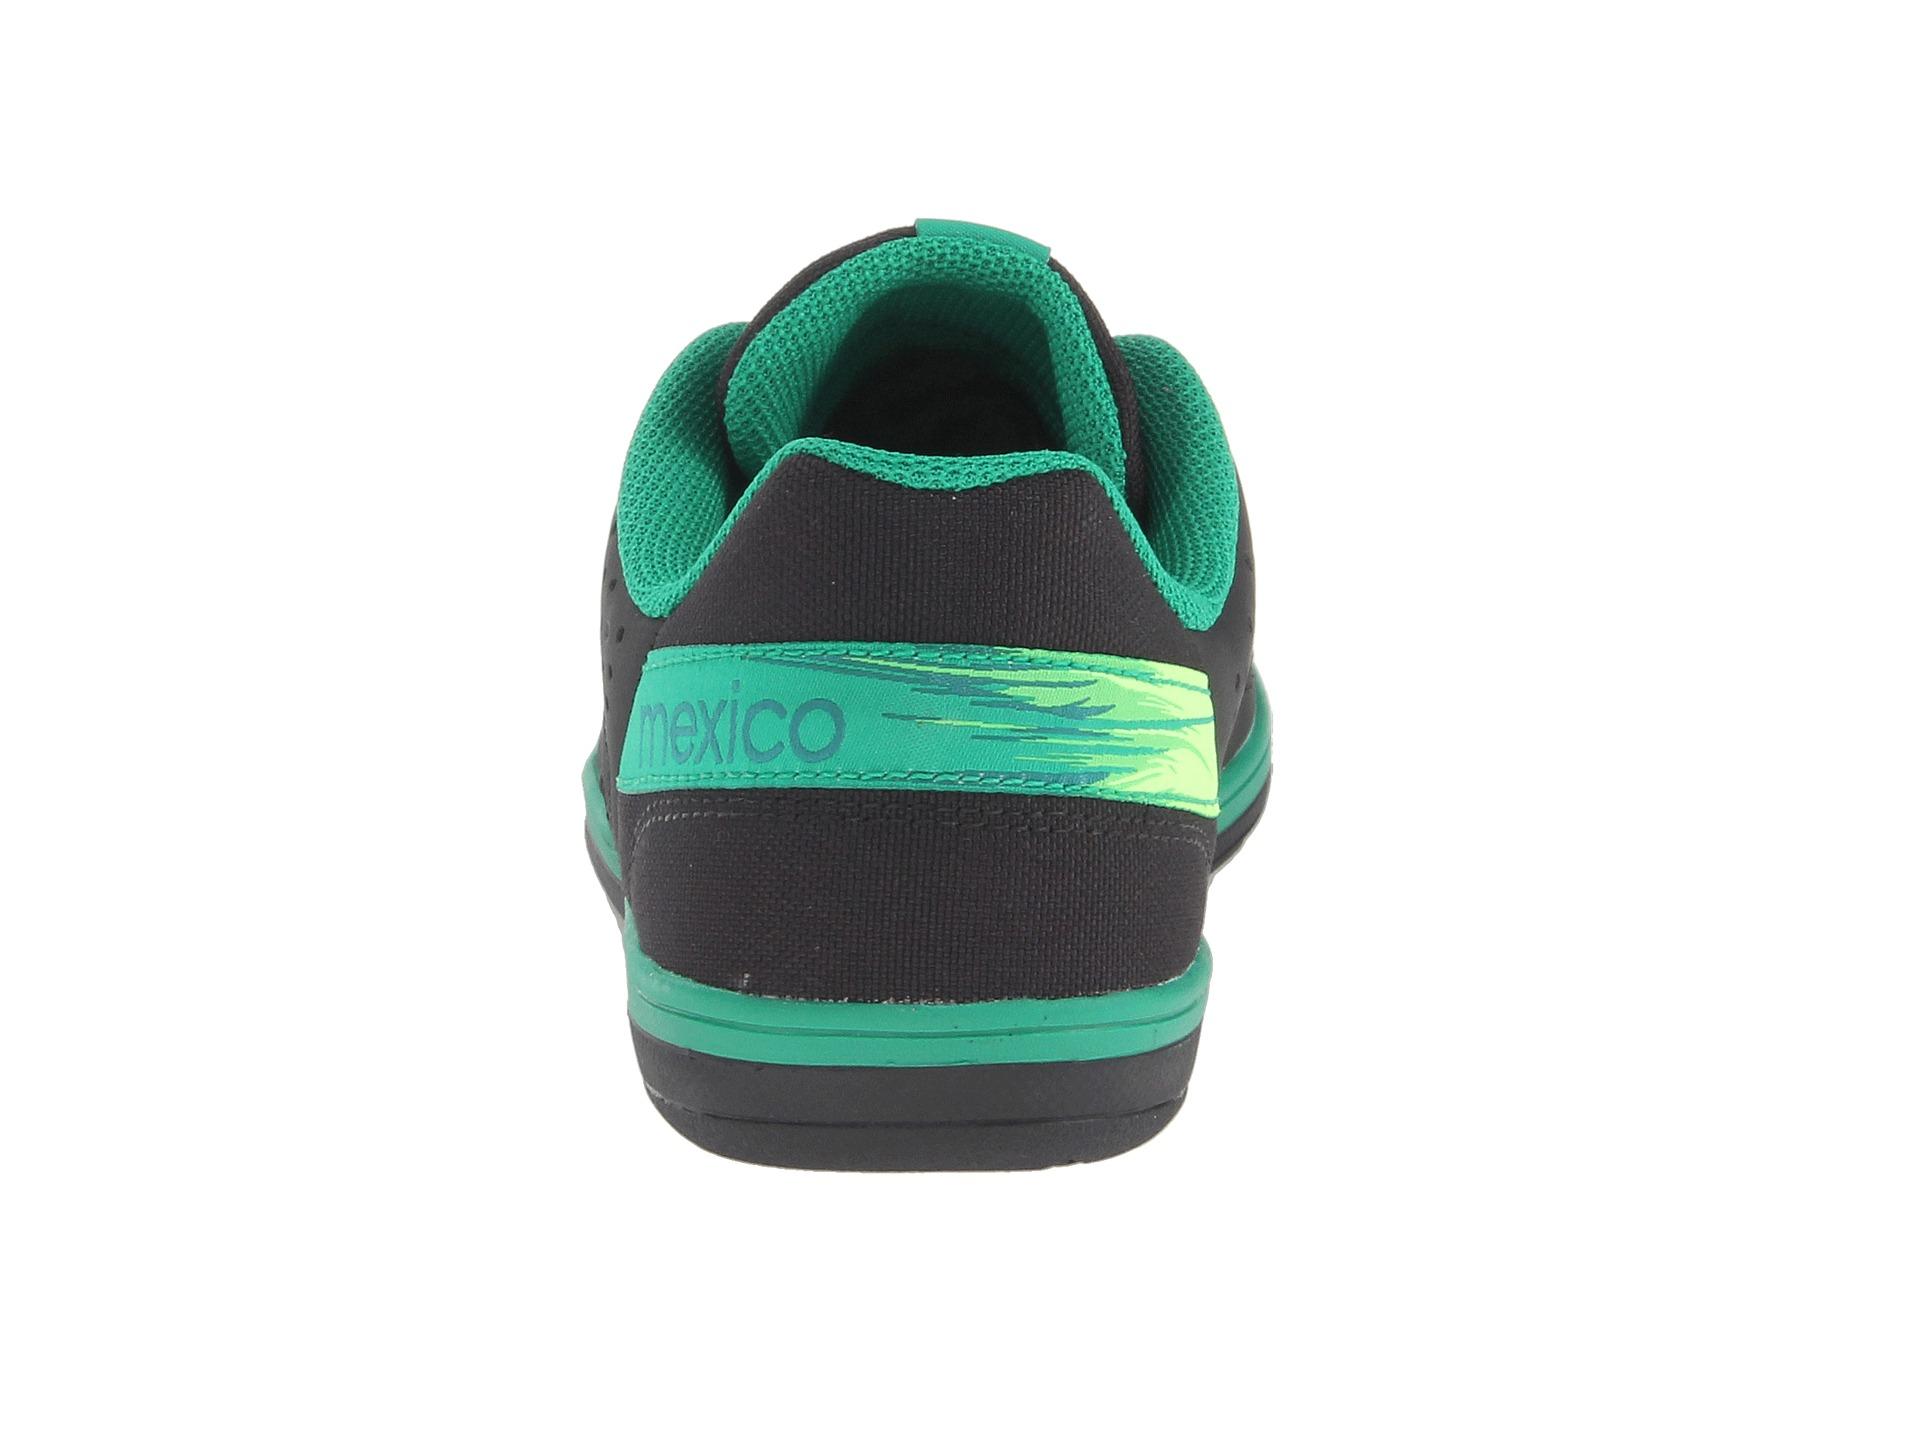 venta minorista gran surtido zapatos de separación adidas Freefootball Janeirinha Sala in Black/Vivid Red/Vivid Green ...